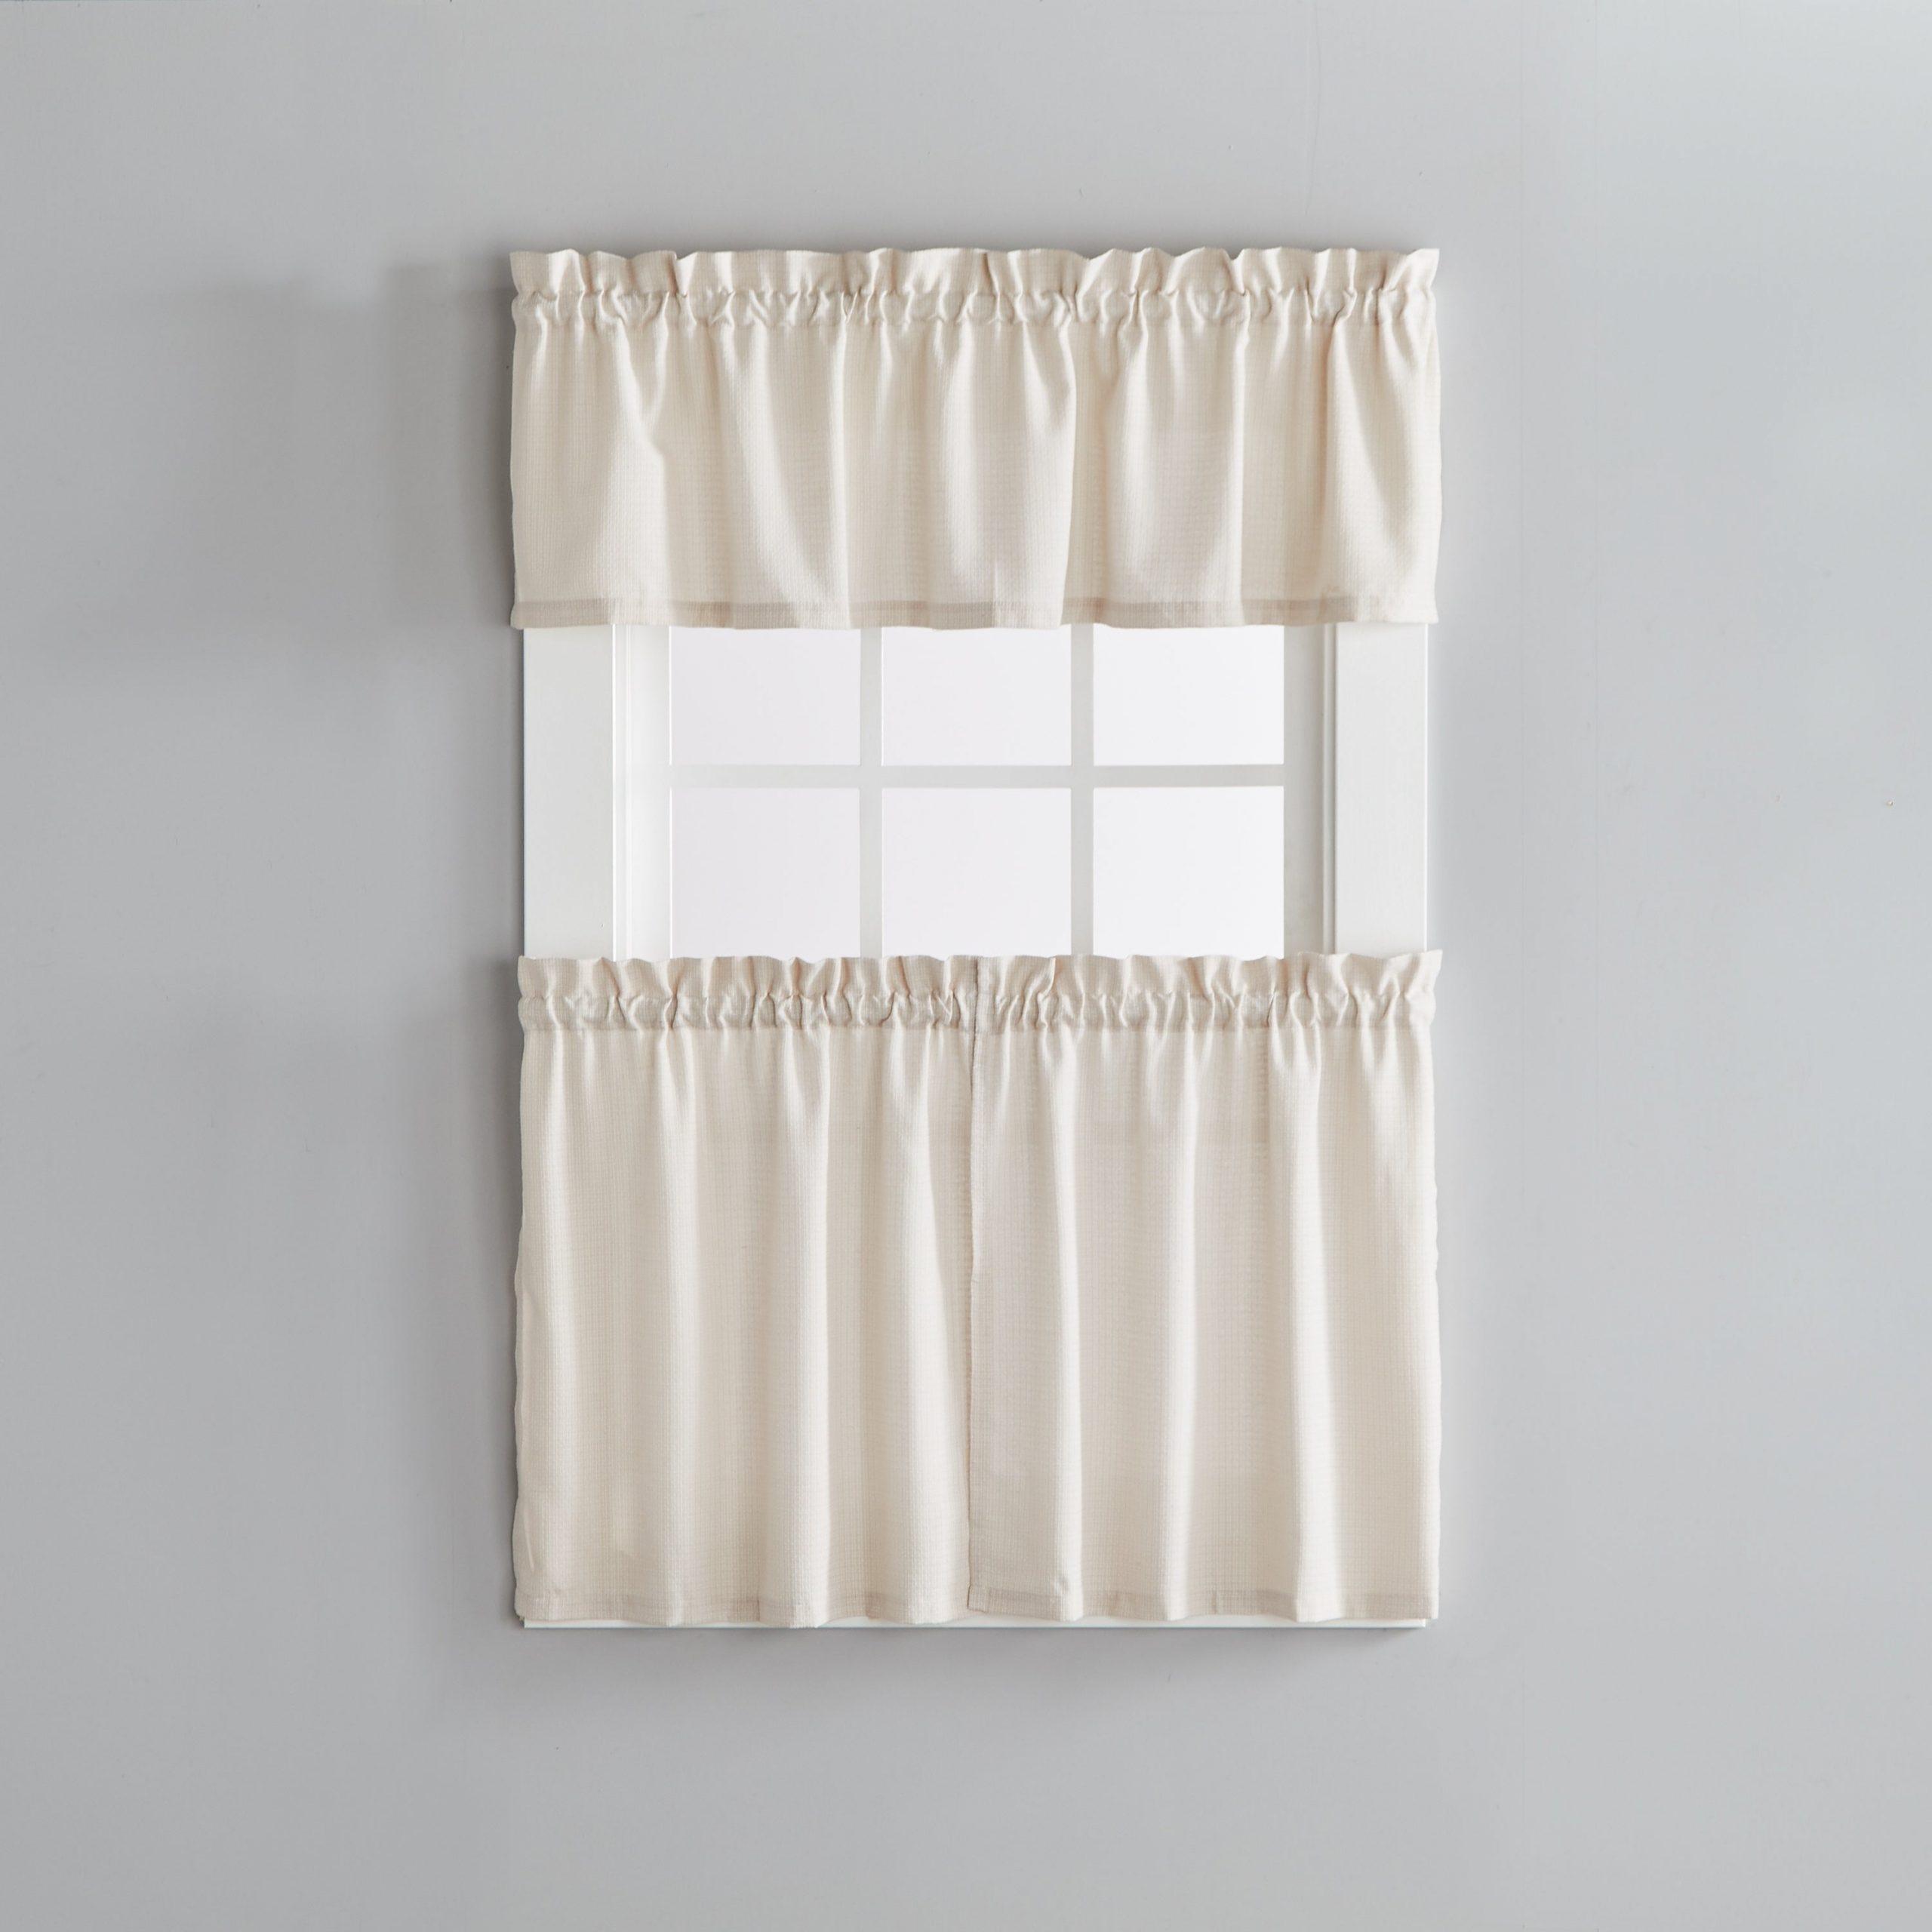 Porch & Den Lorentz Linen 24 Inch Tier Pair Inside 2020 Oakwood Linen Style Decorative Window Curtain Tier Sets (View 14 of 20)